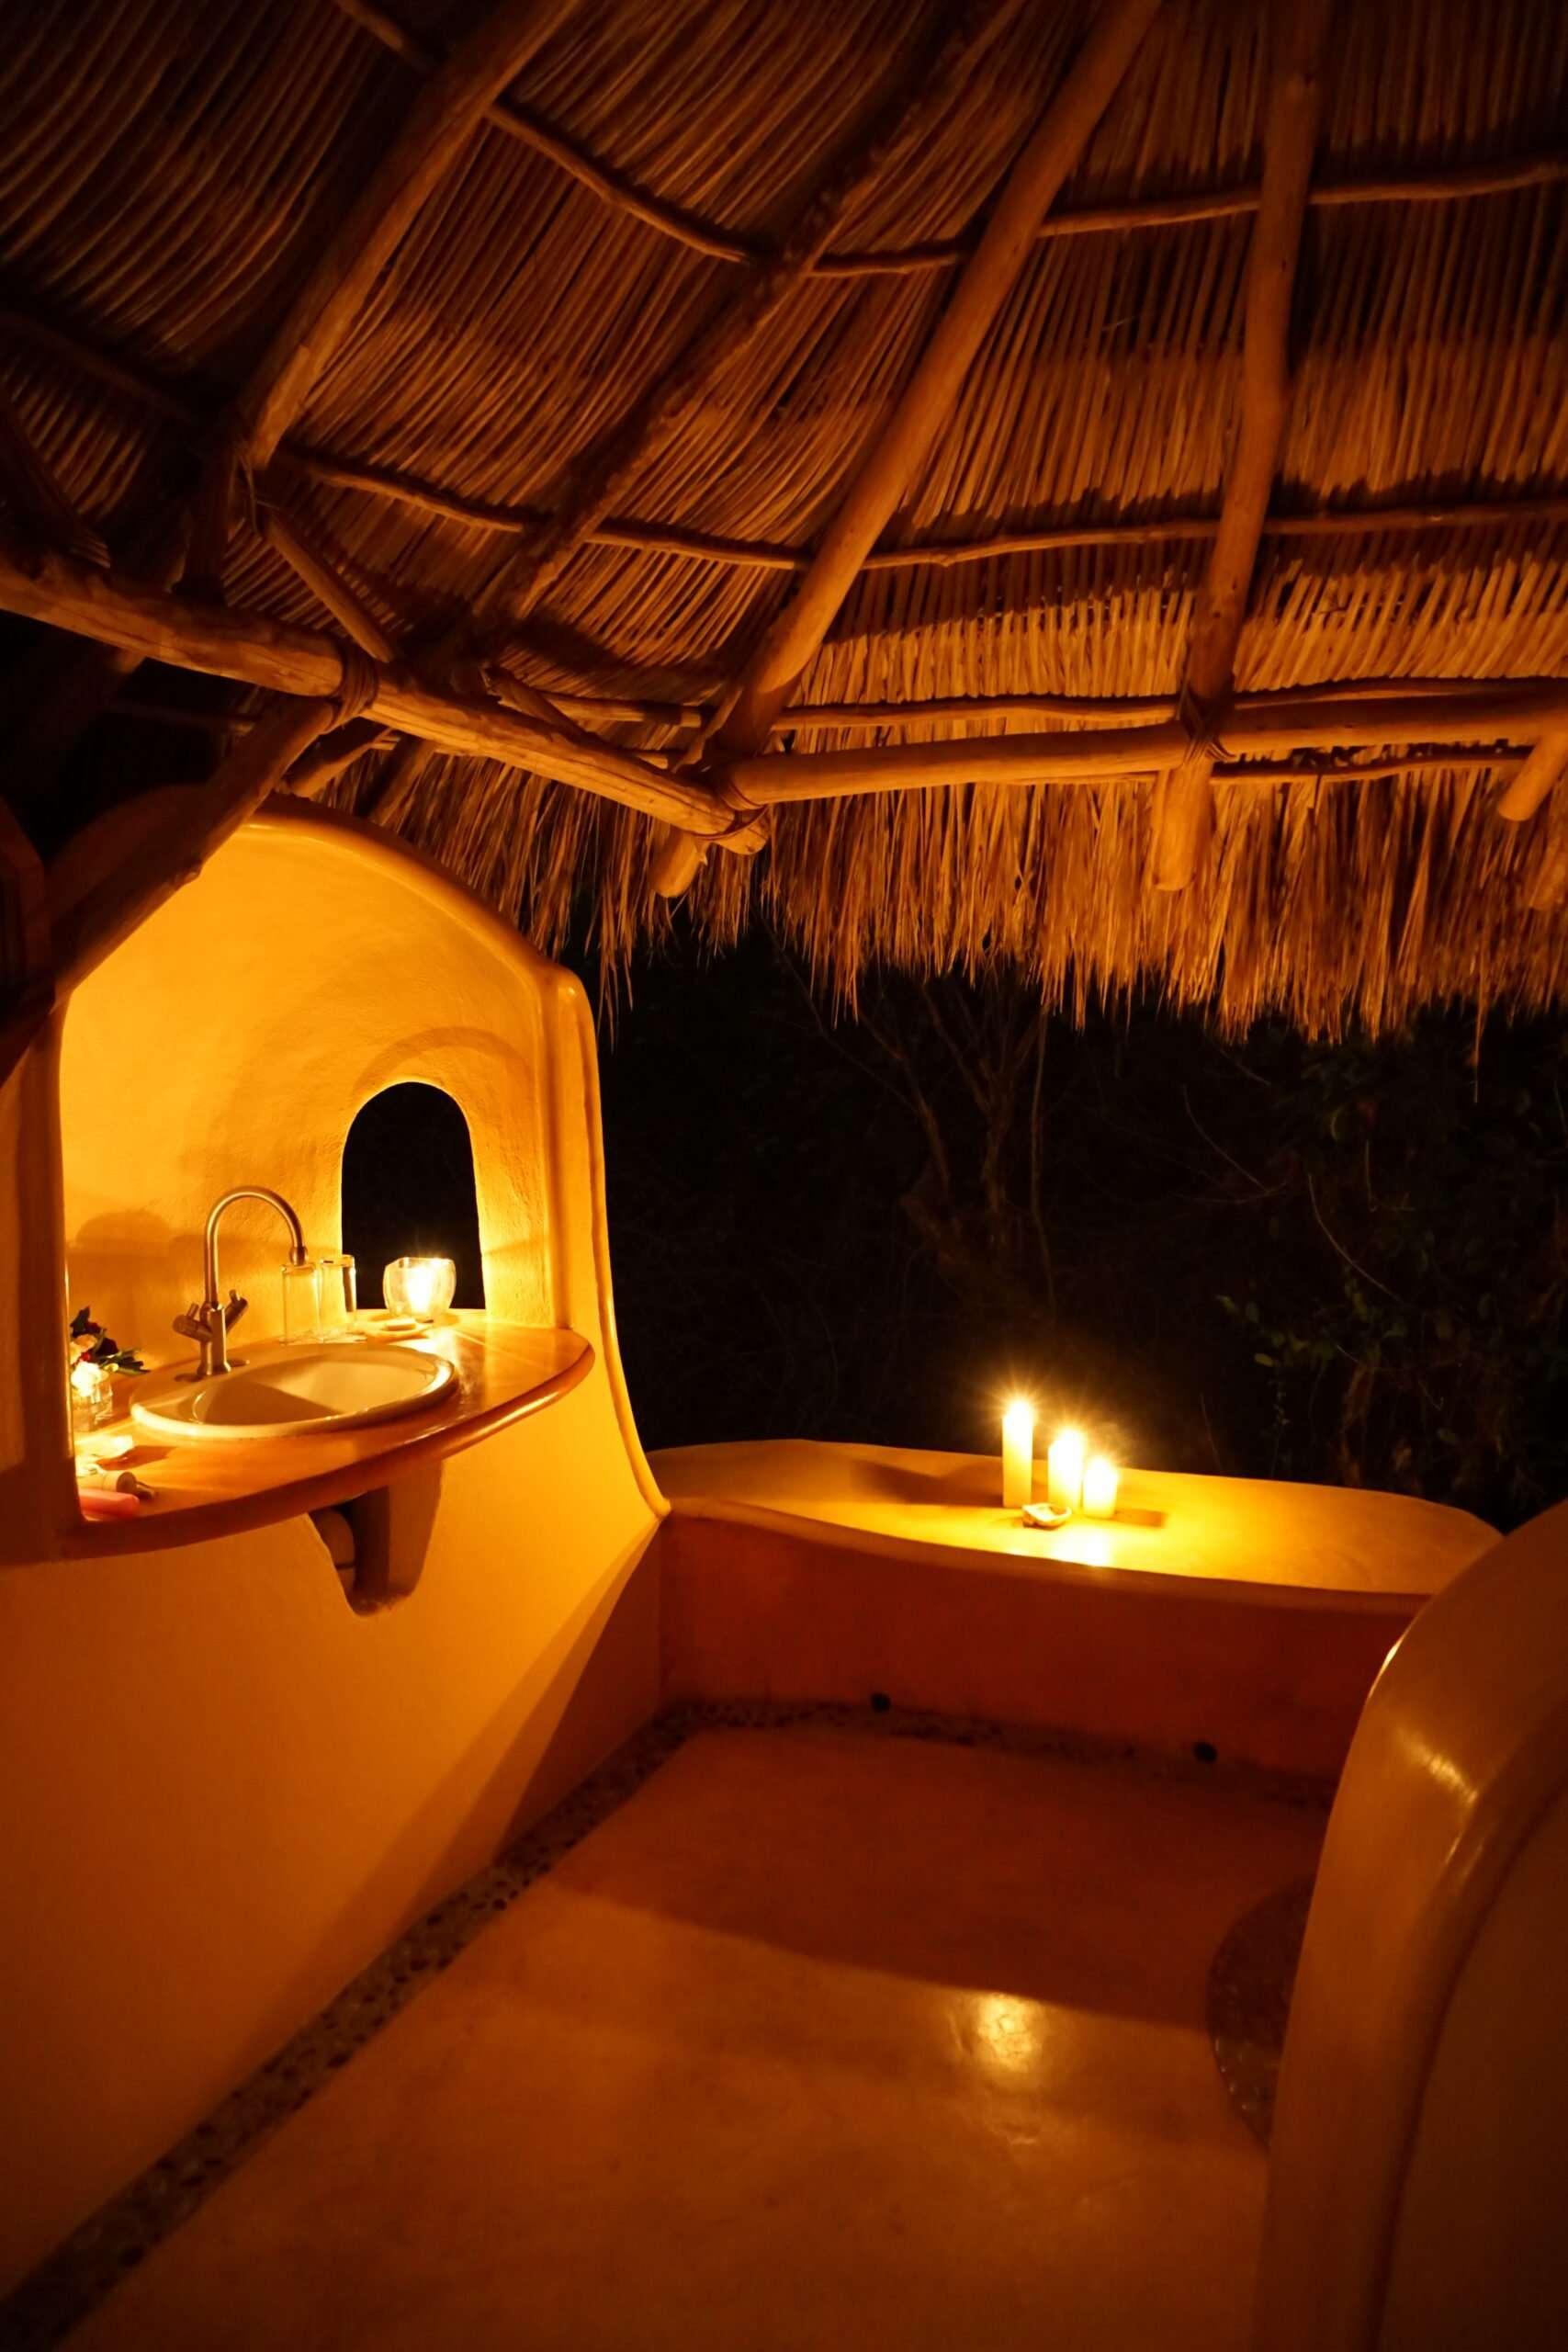 haramara retreat casita bathroom in candlelight